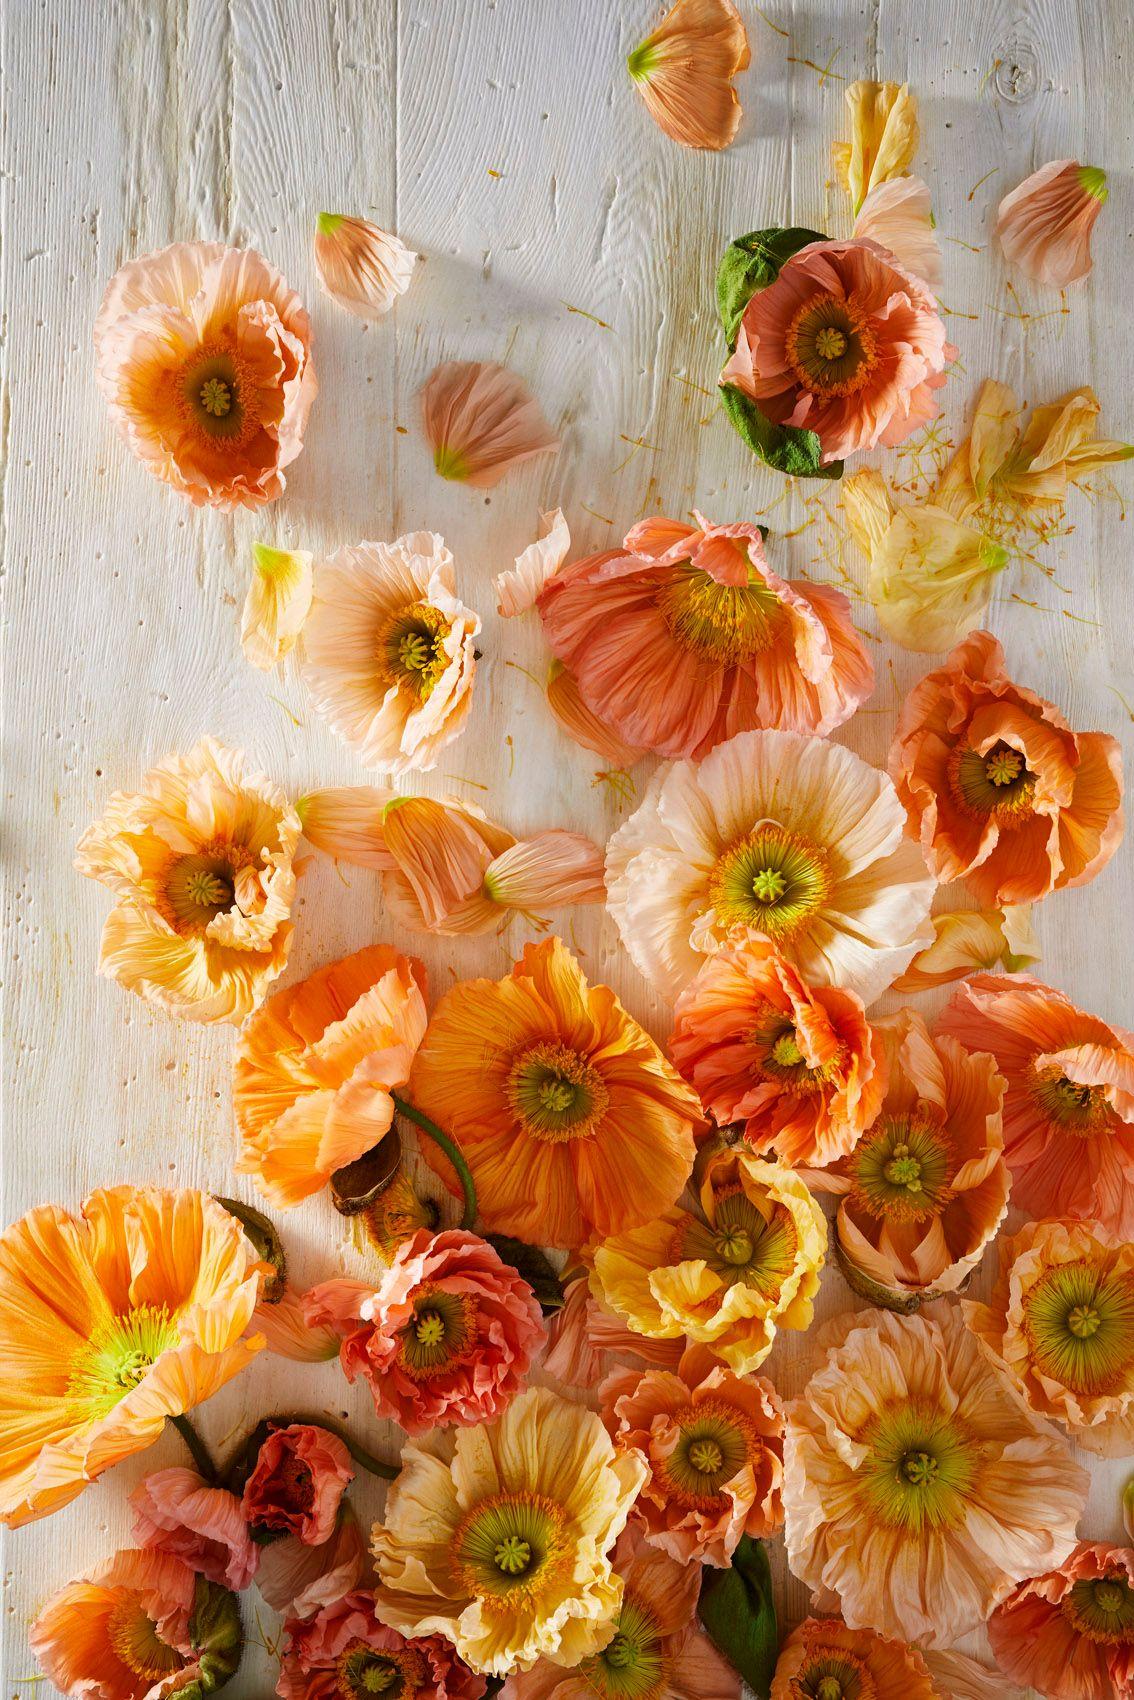 ChristopherWhite_Floral Study_3.jpg